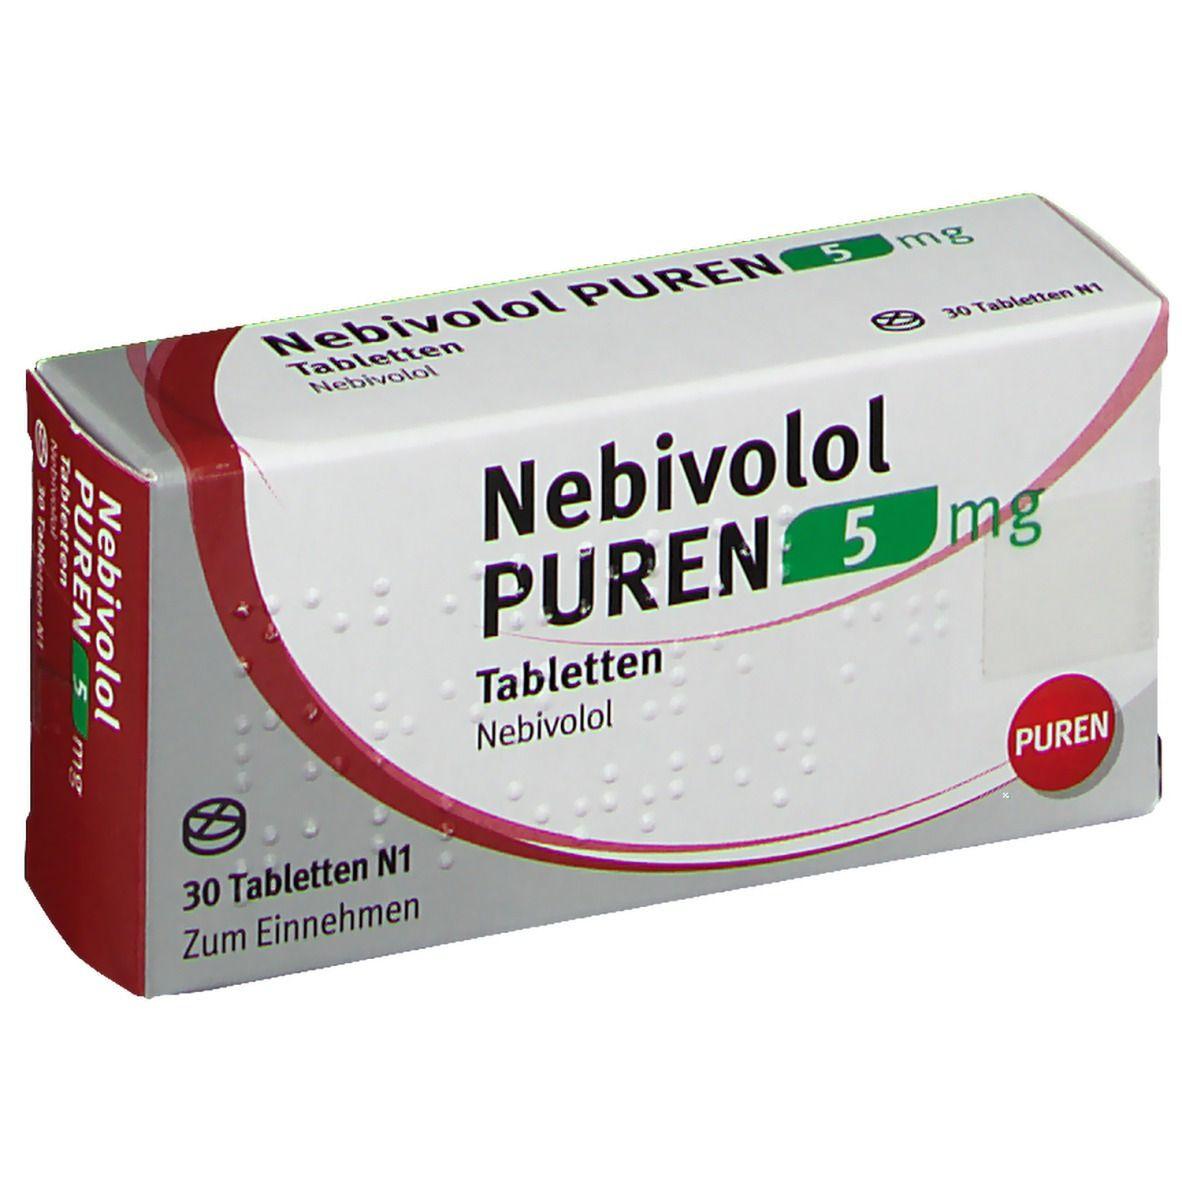 NEBIVOLOL PUREN 5 mg Tabletten